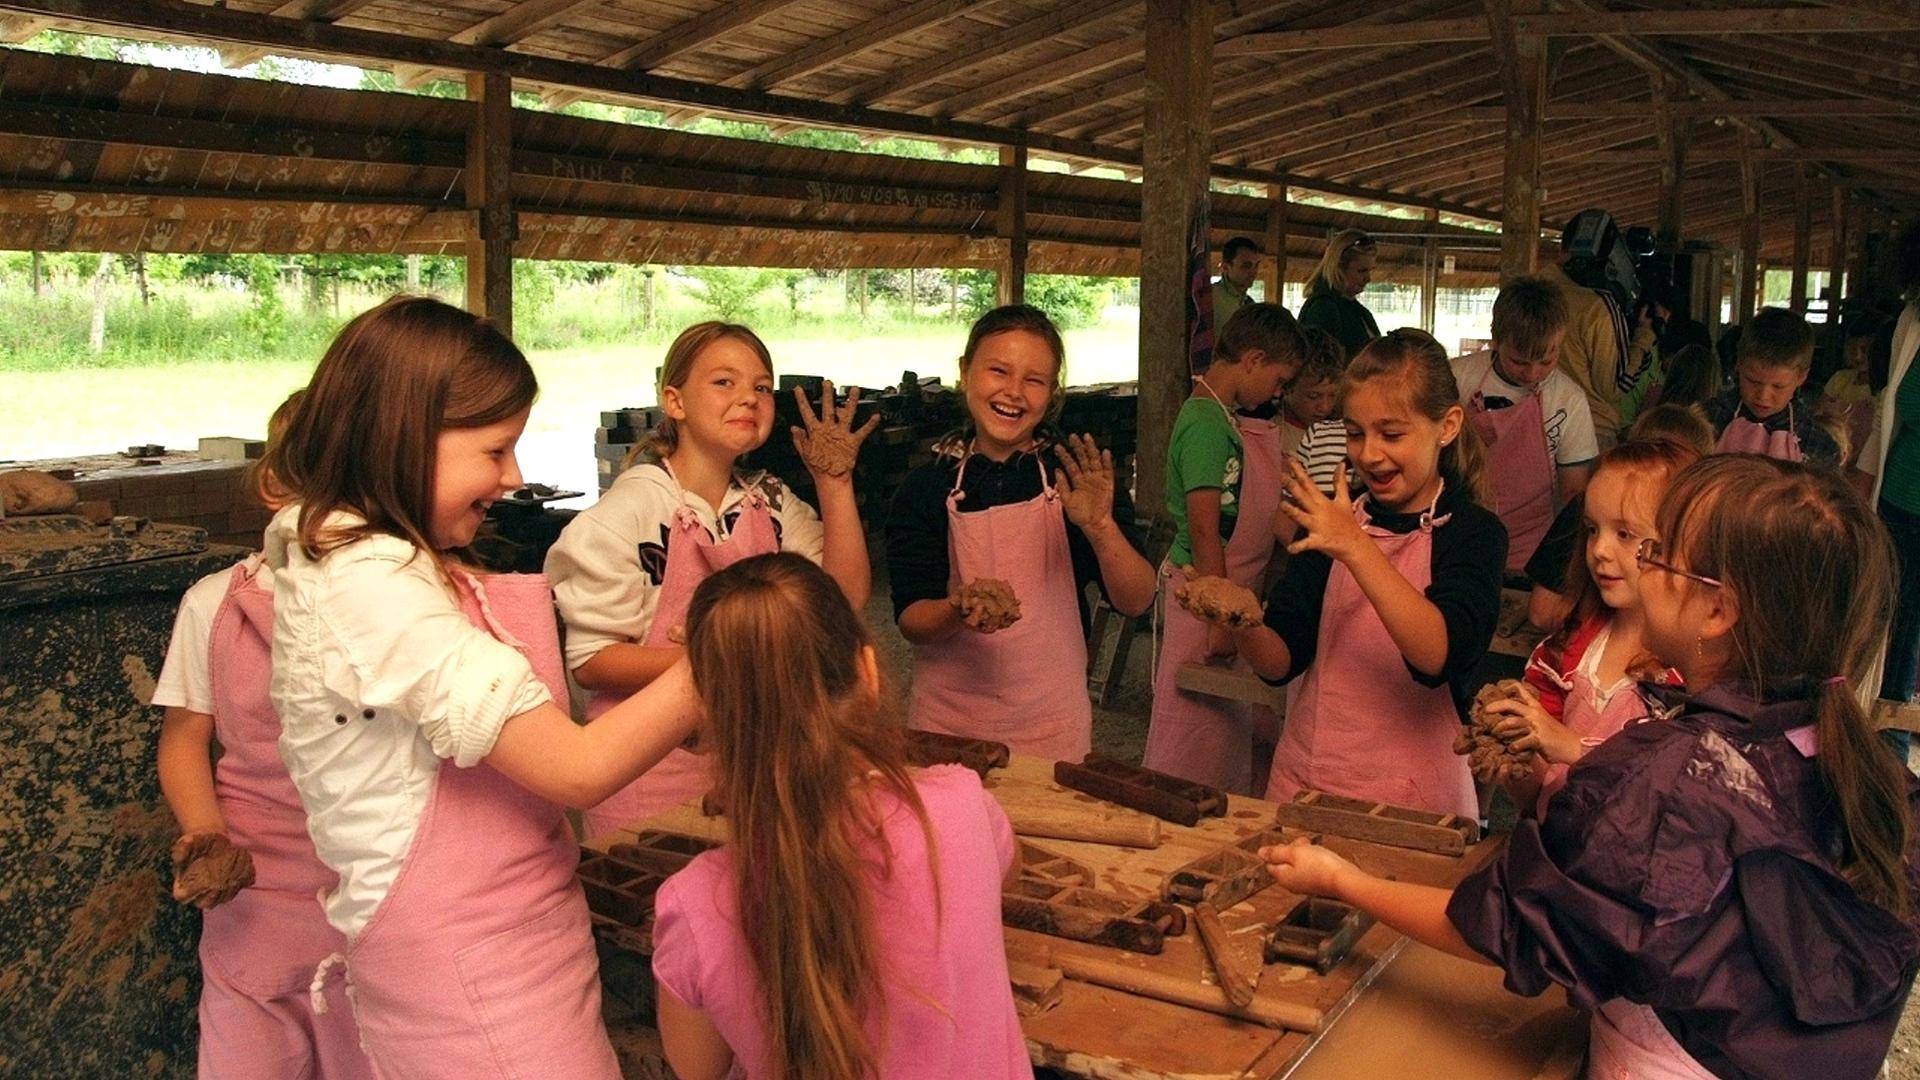 Camping-Zelten-Mecklenburg-Seenkette-Mueritz-Alter-Hafen-Klassenfahrt-Klassenreise-04